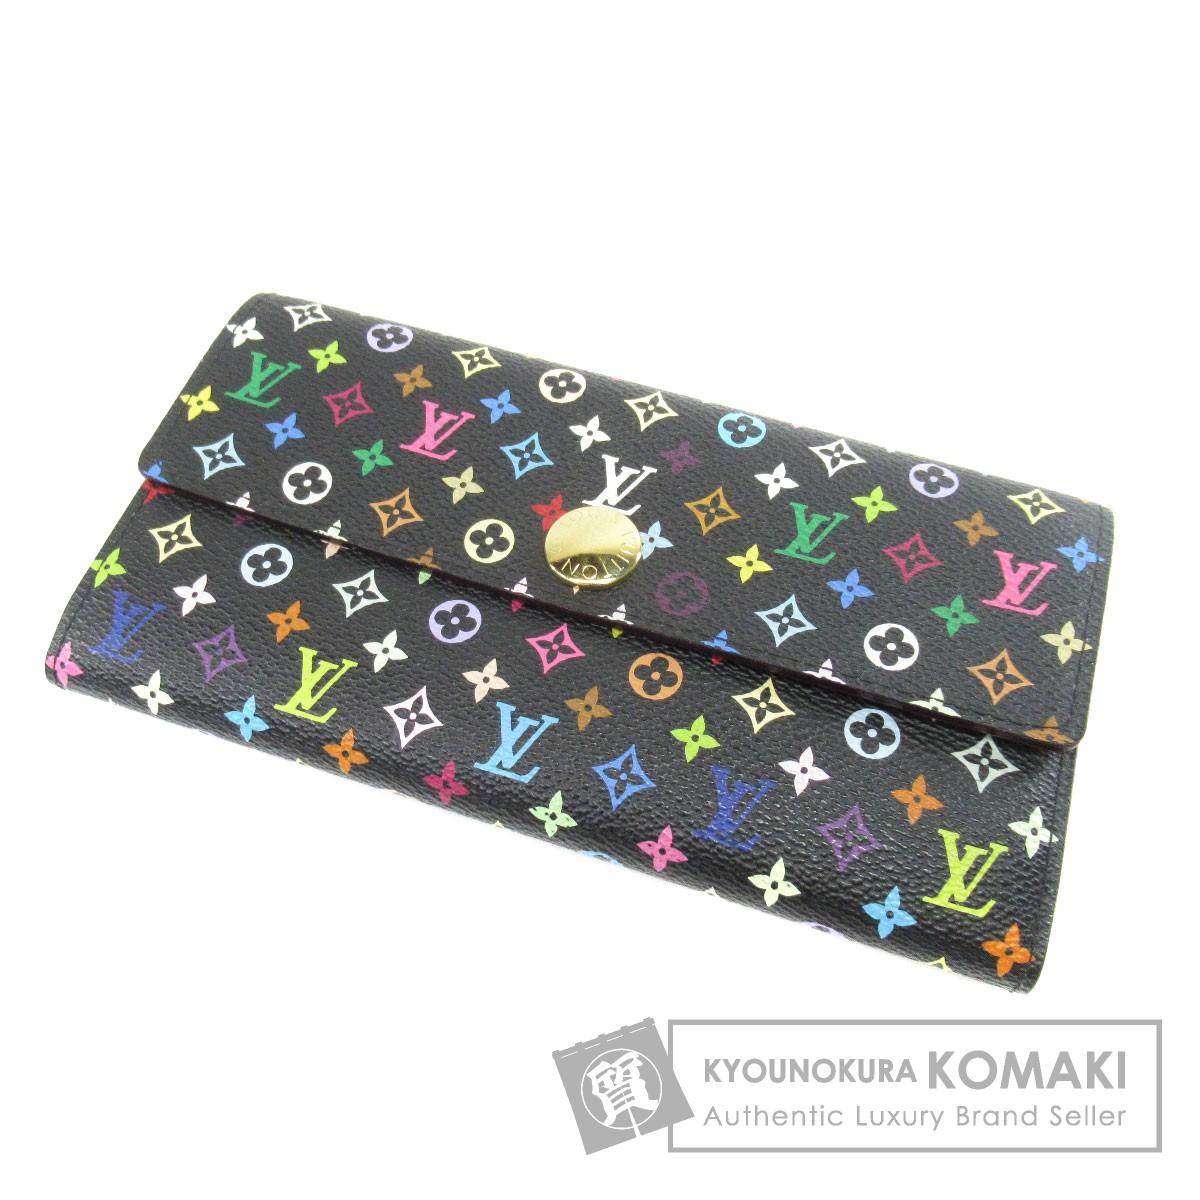 M93533 ポルトフォイユ サラ 長財布(小銭入れあり) モノグラムマルチカラーキャンバス レディース 【中古】【】